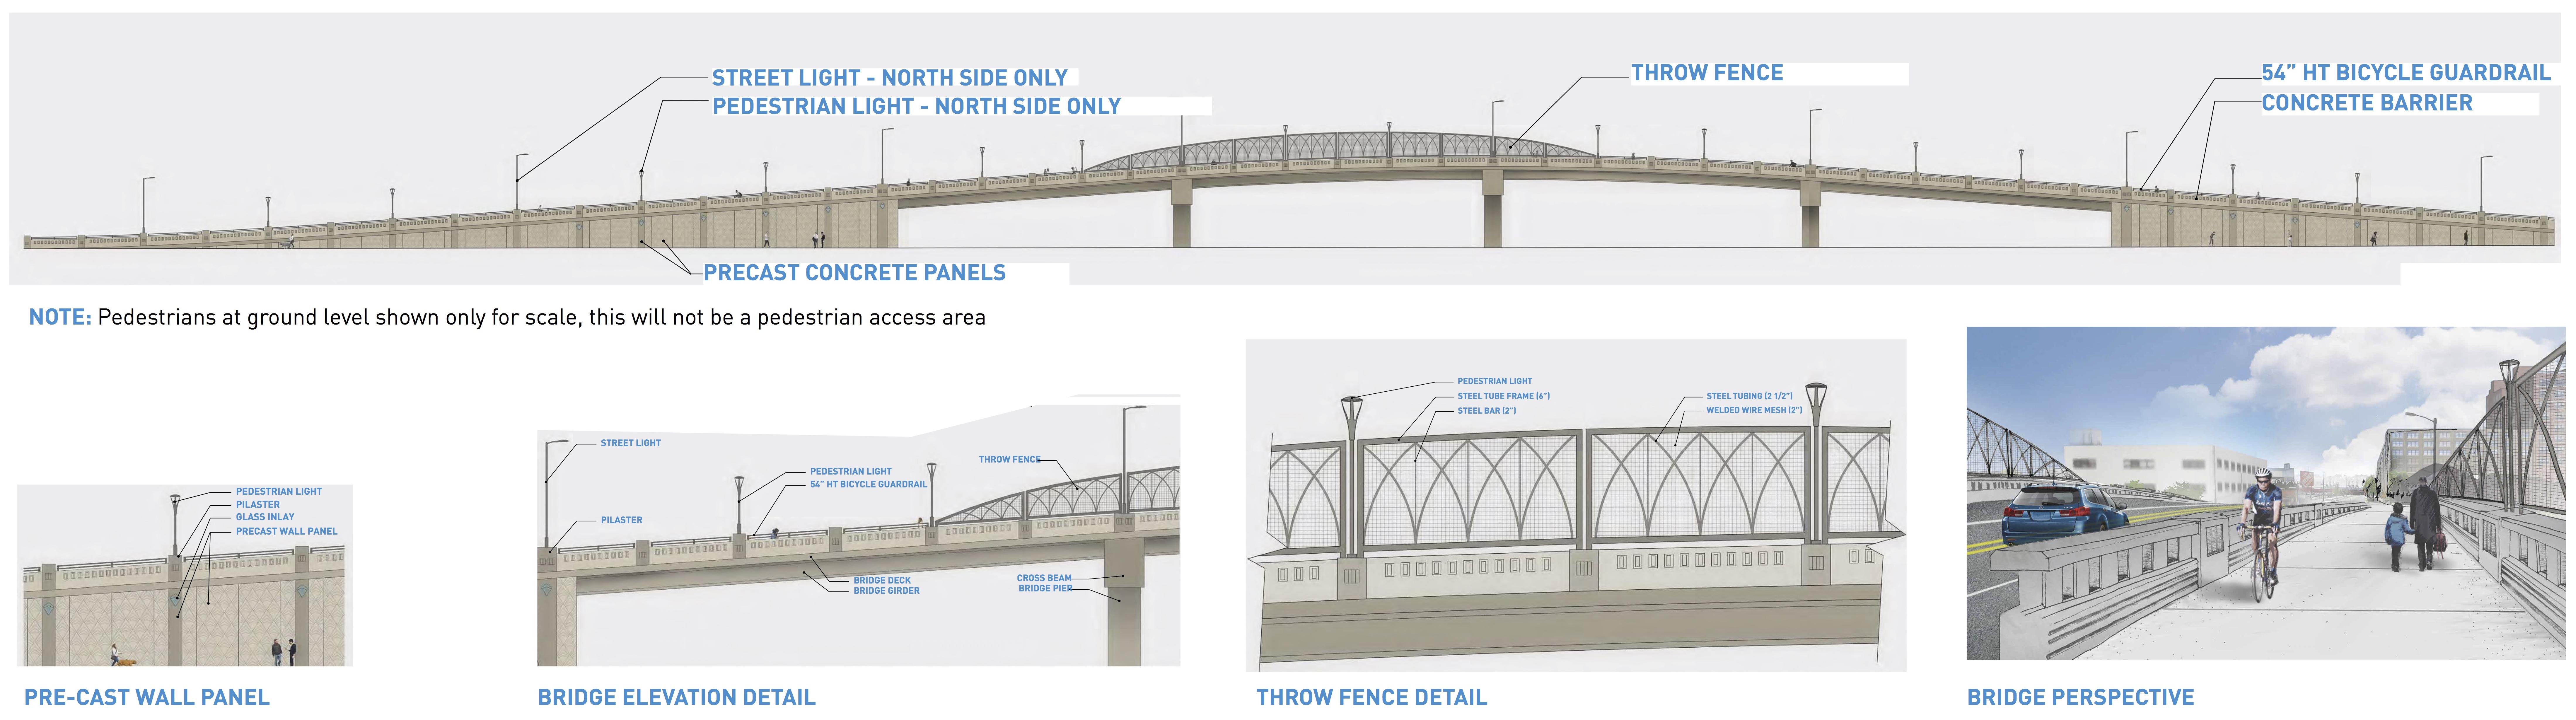 South Lander Street Bridge Project Releases Updated Design